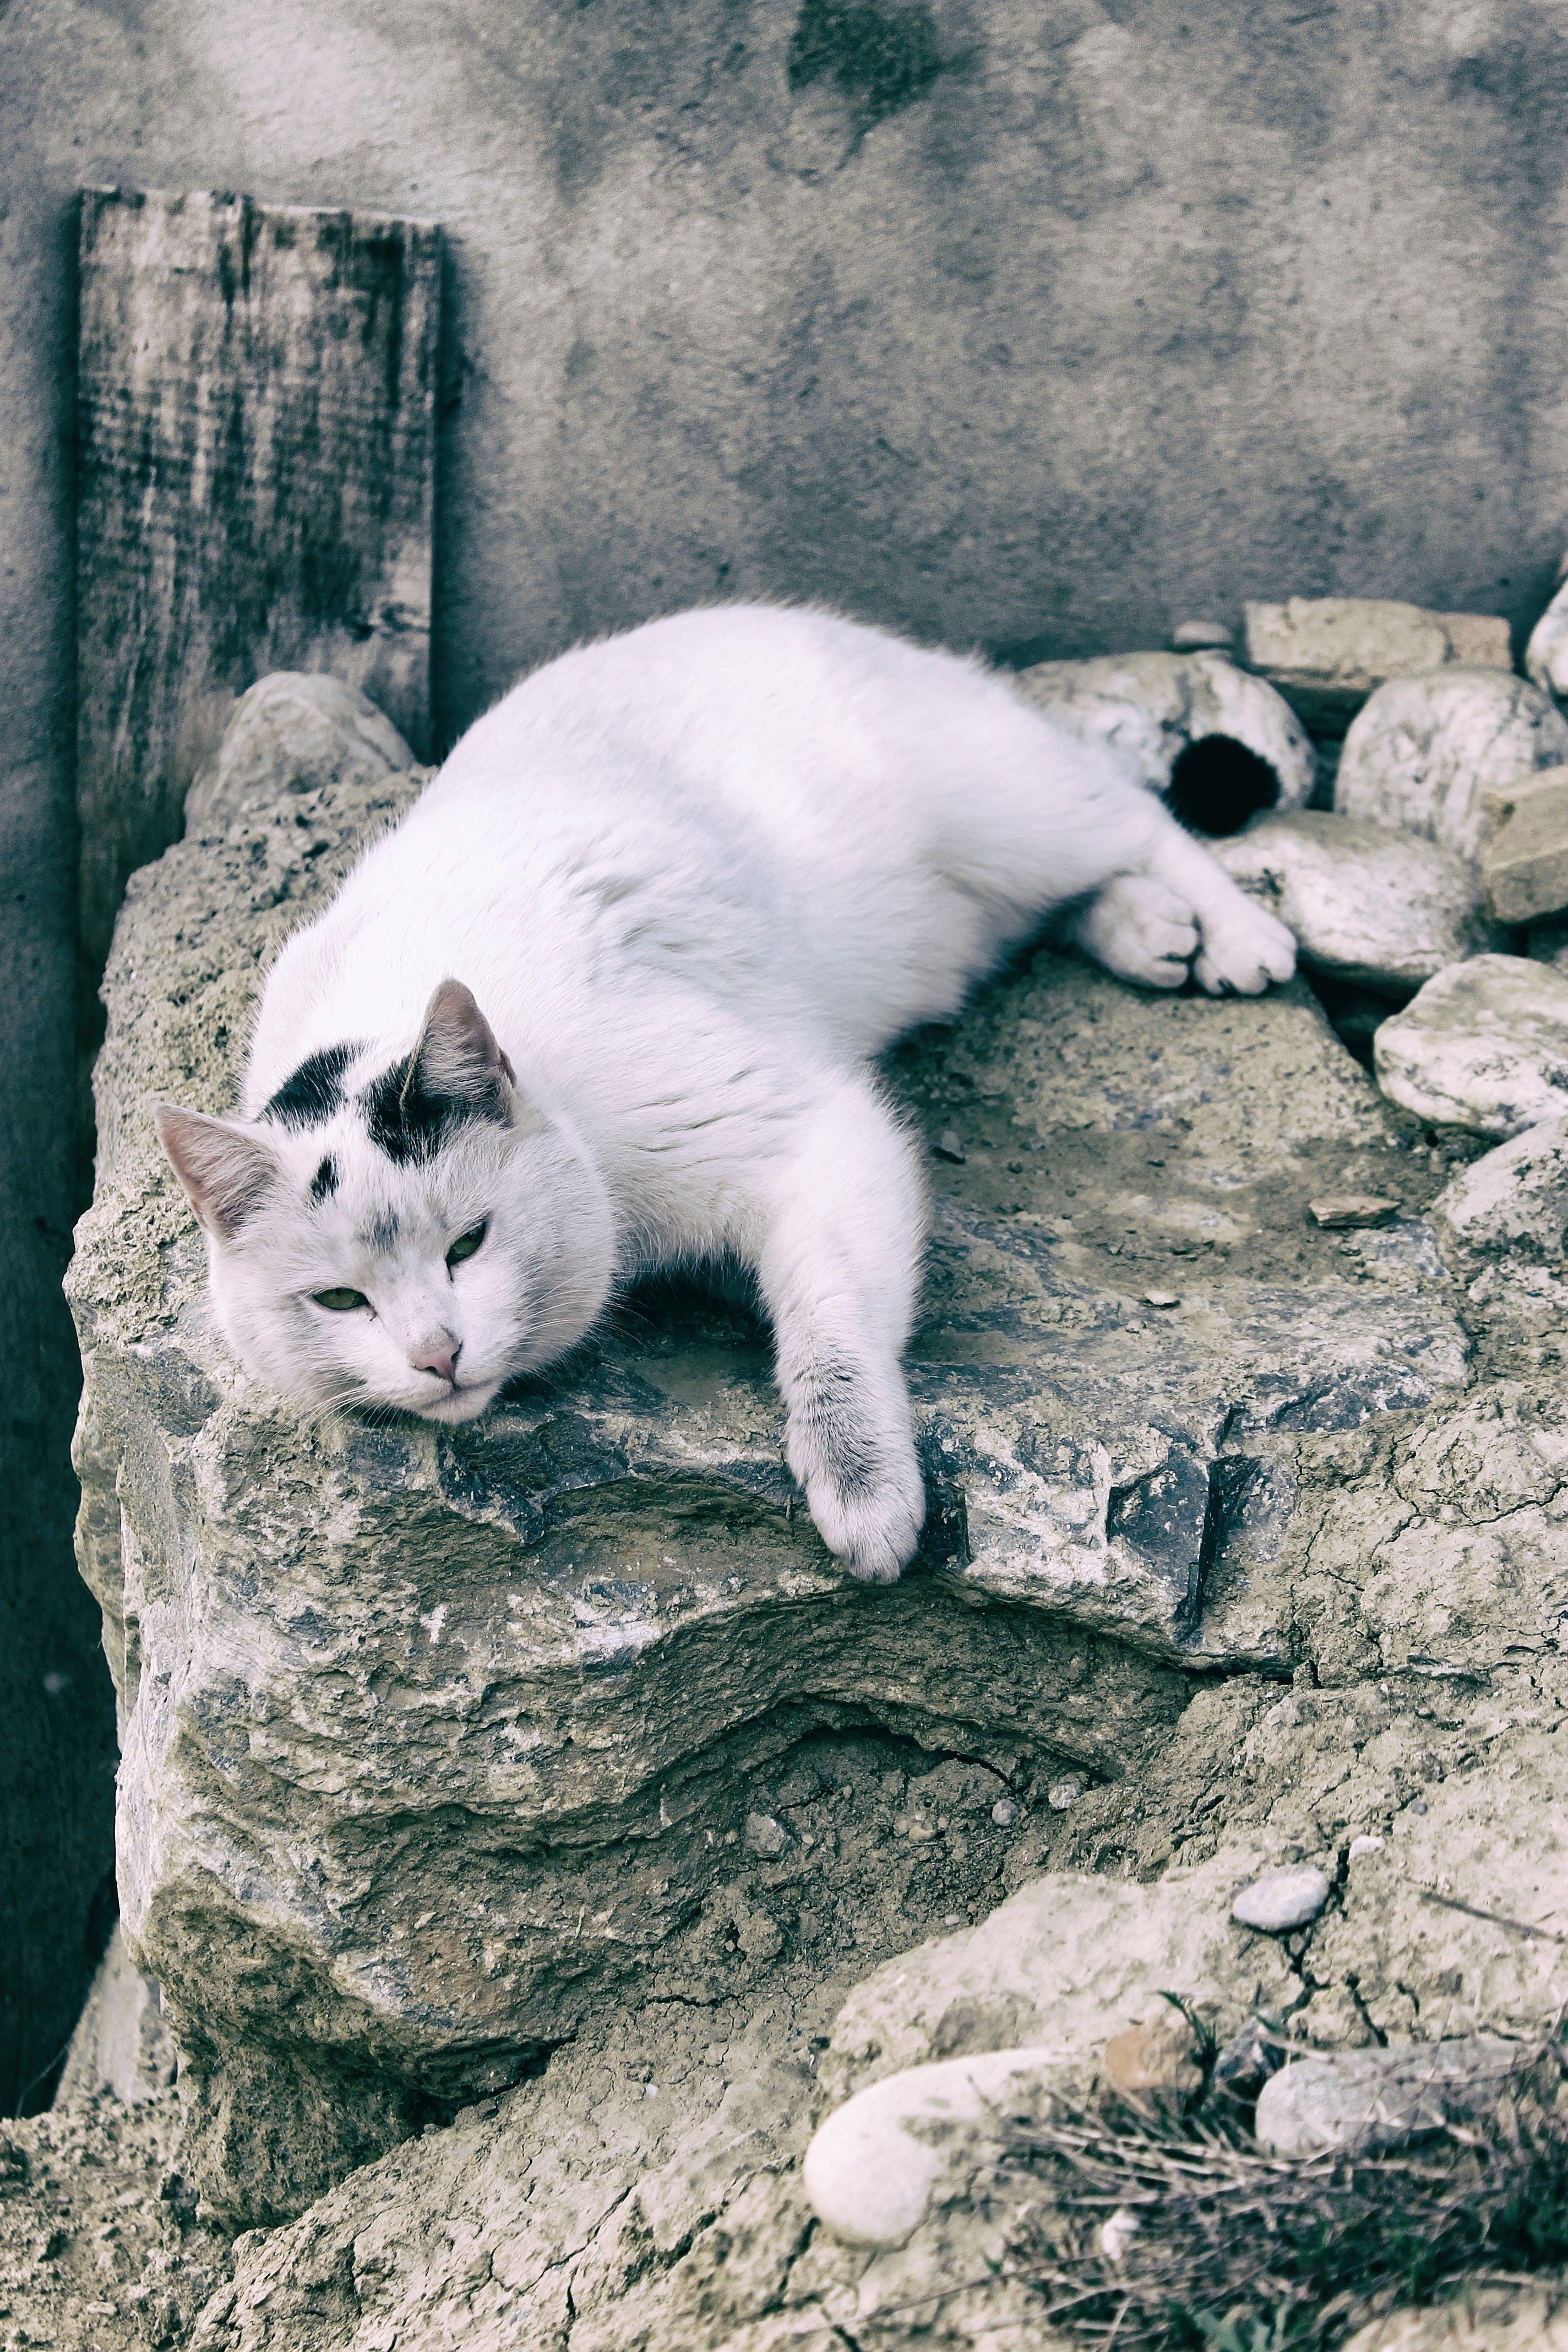 Cat Lying Down on Gray Rock